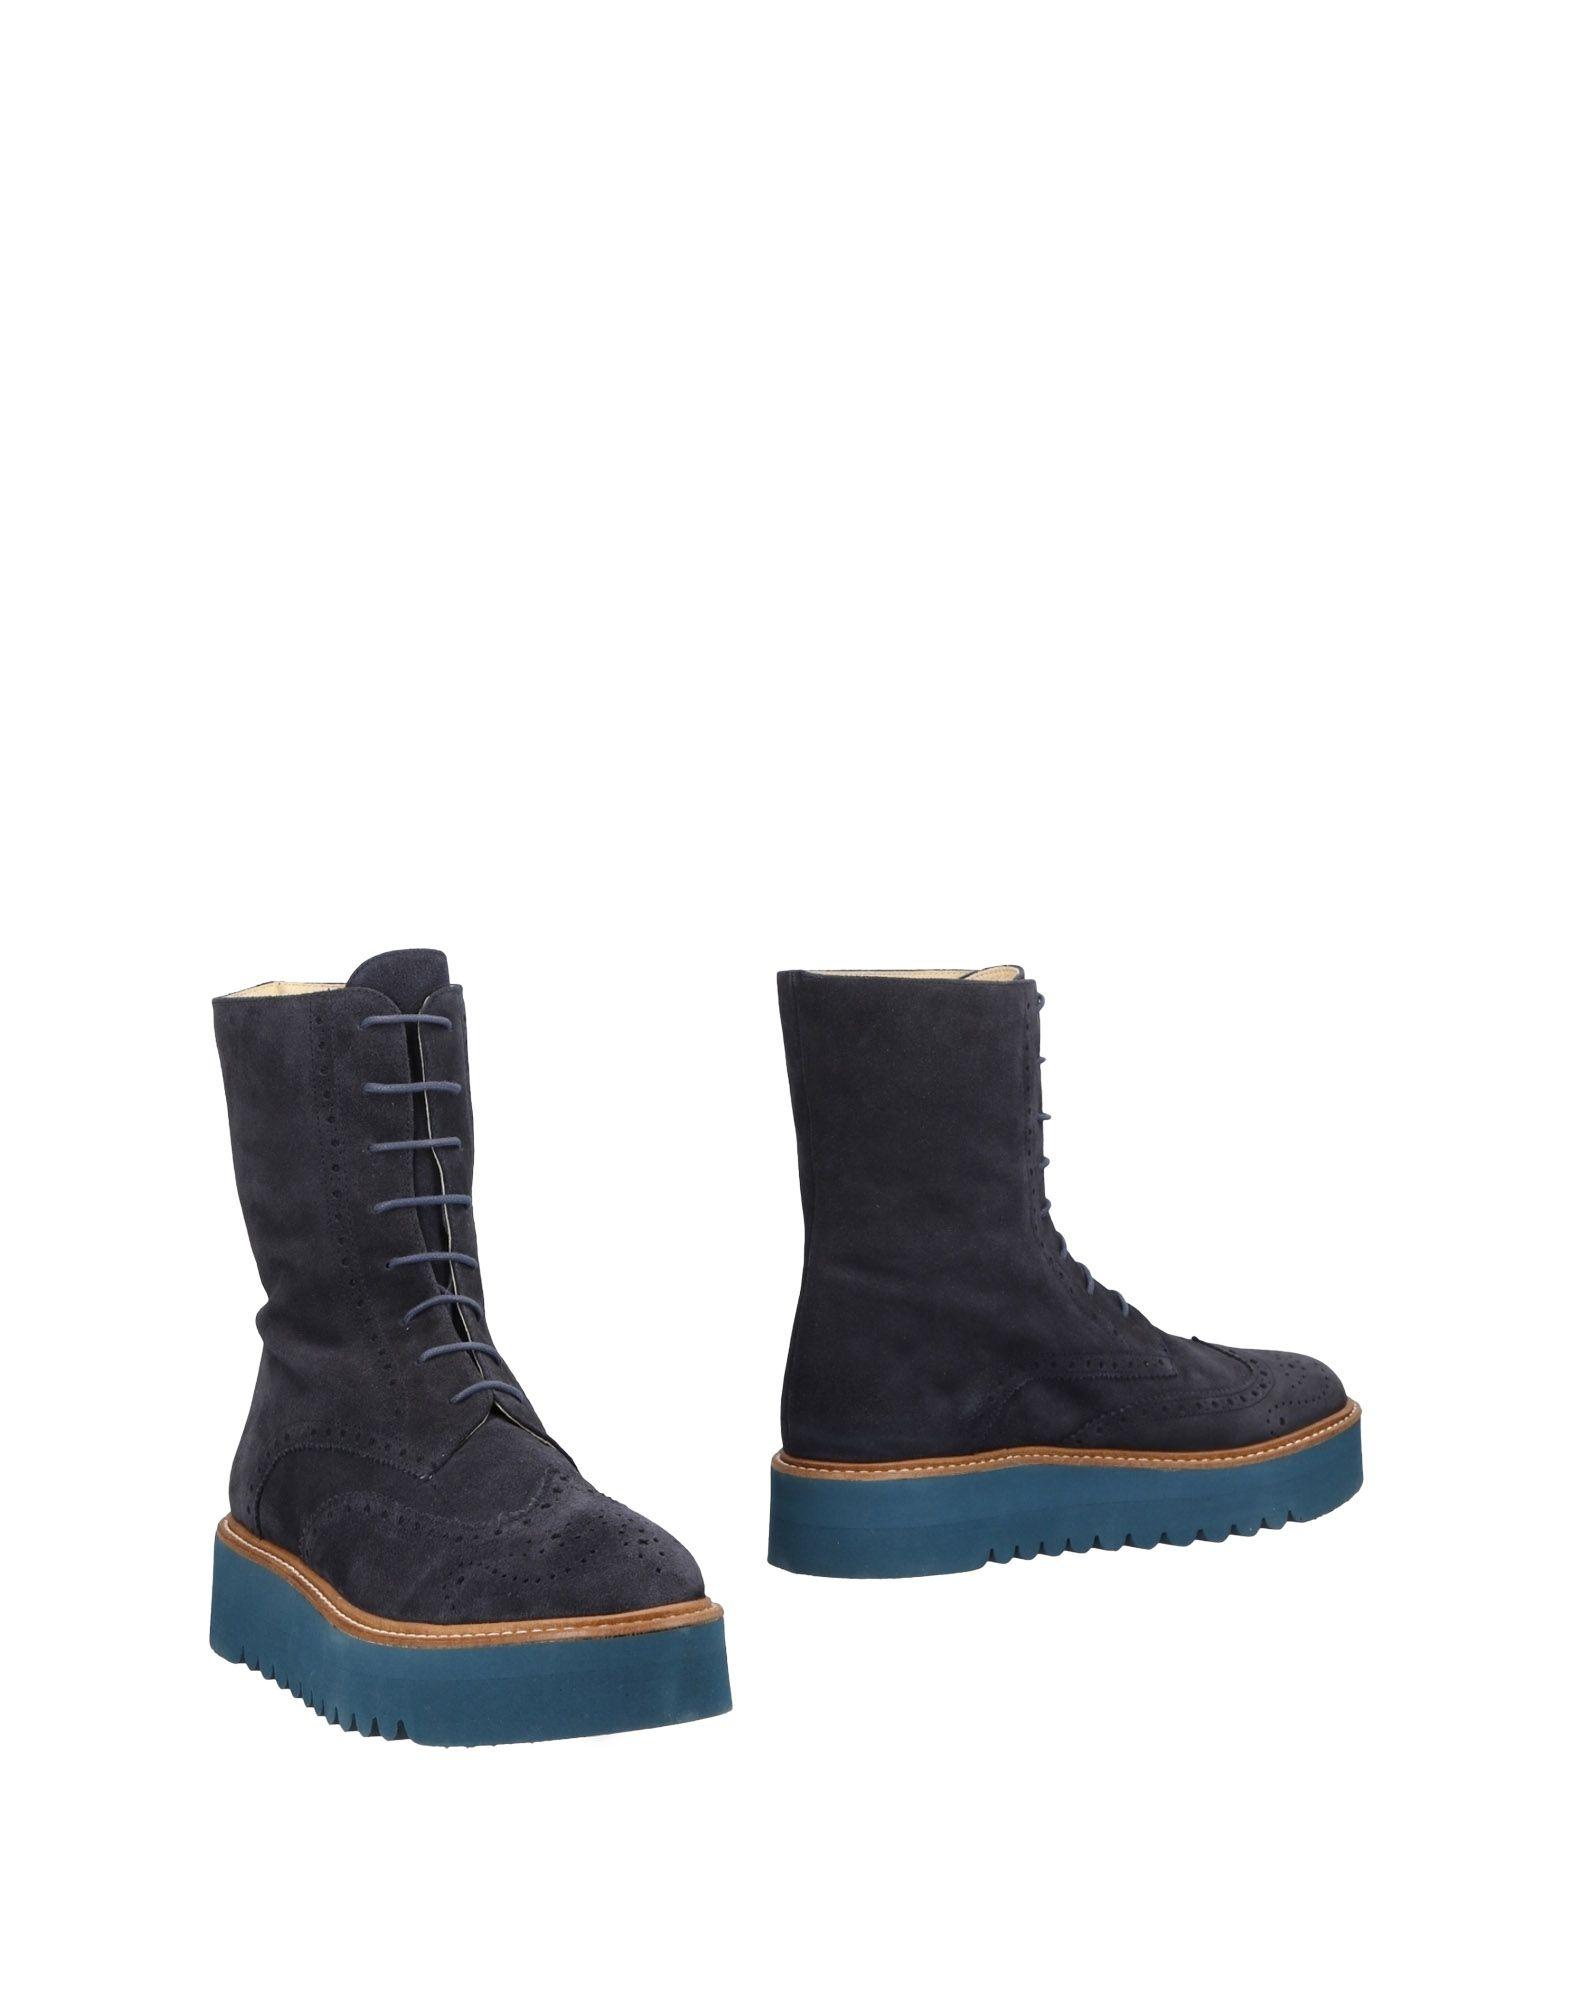 Stilvolle billige Schuhe Palomitas By Paloma Barceló Stiefelette Damen Damen Damen  11488191PL 4b945e